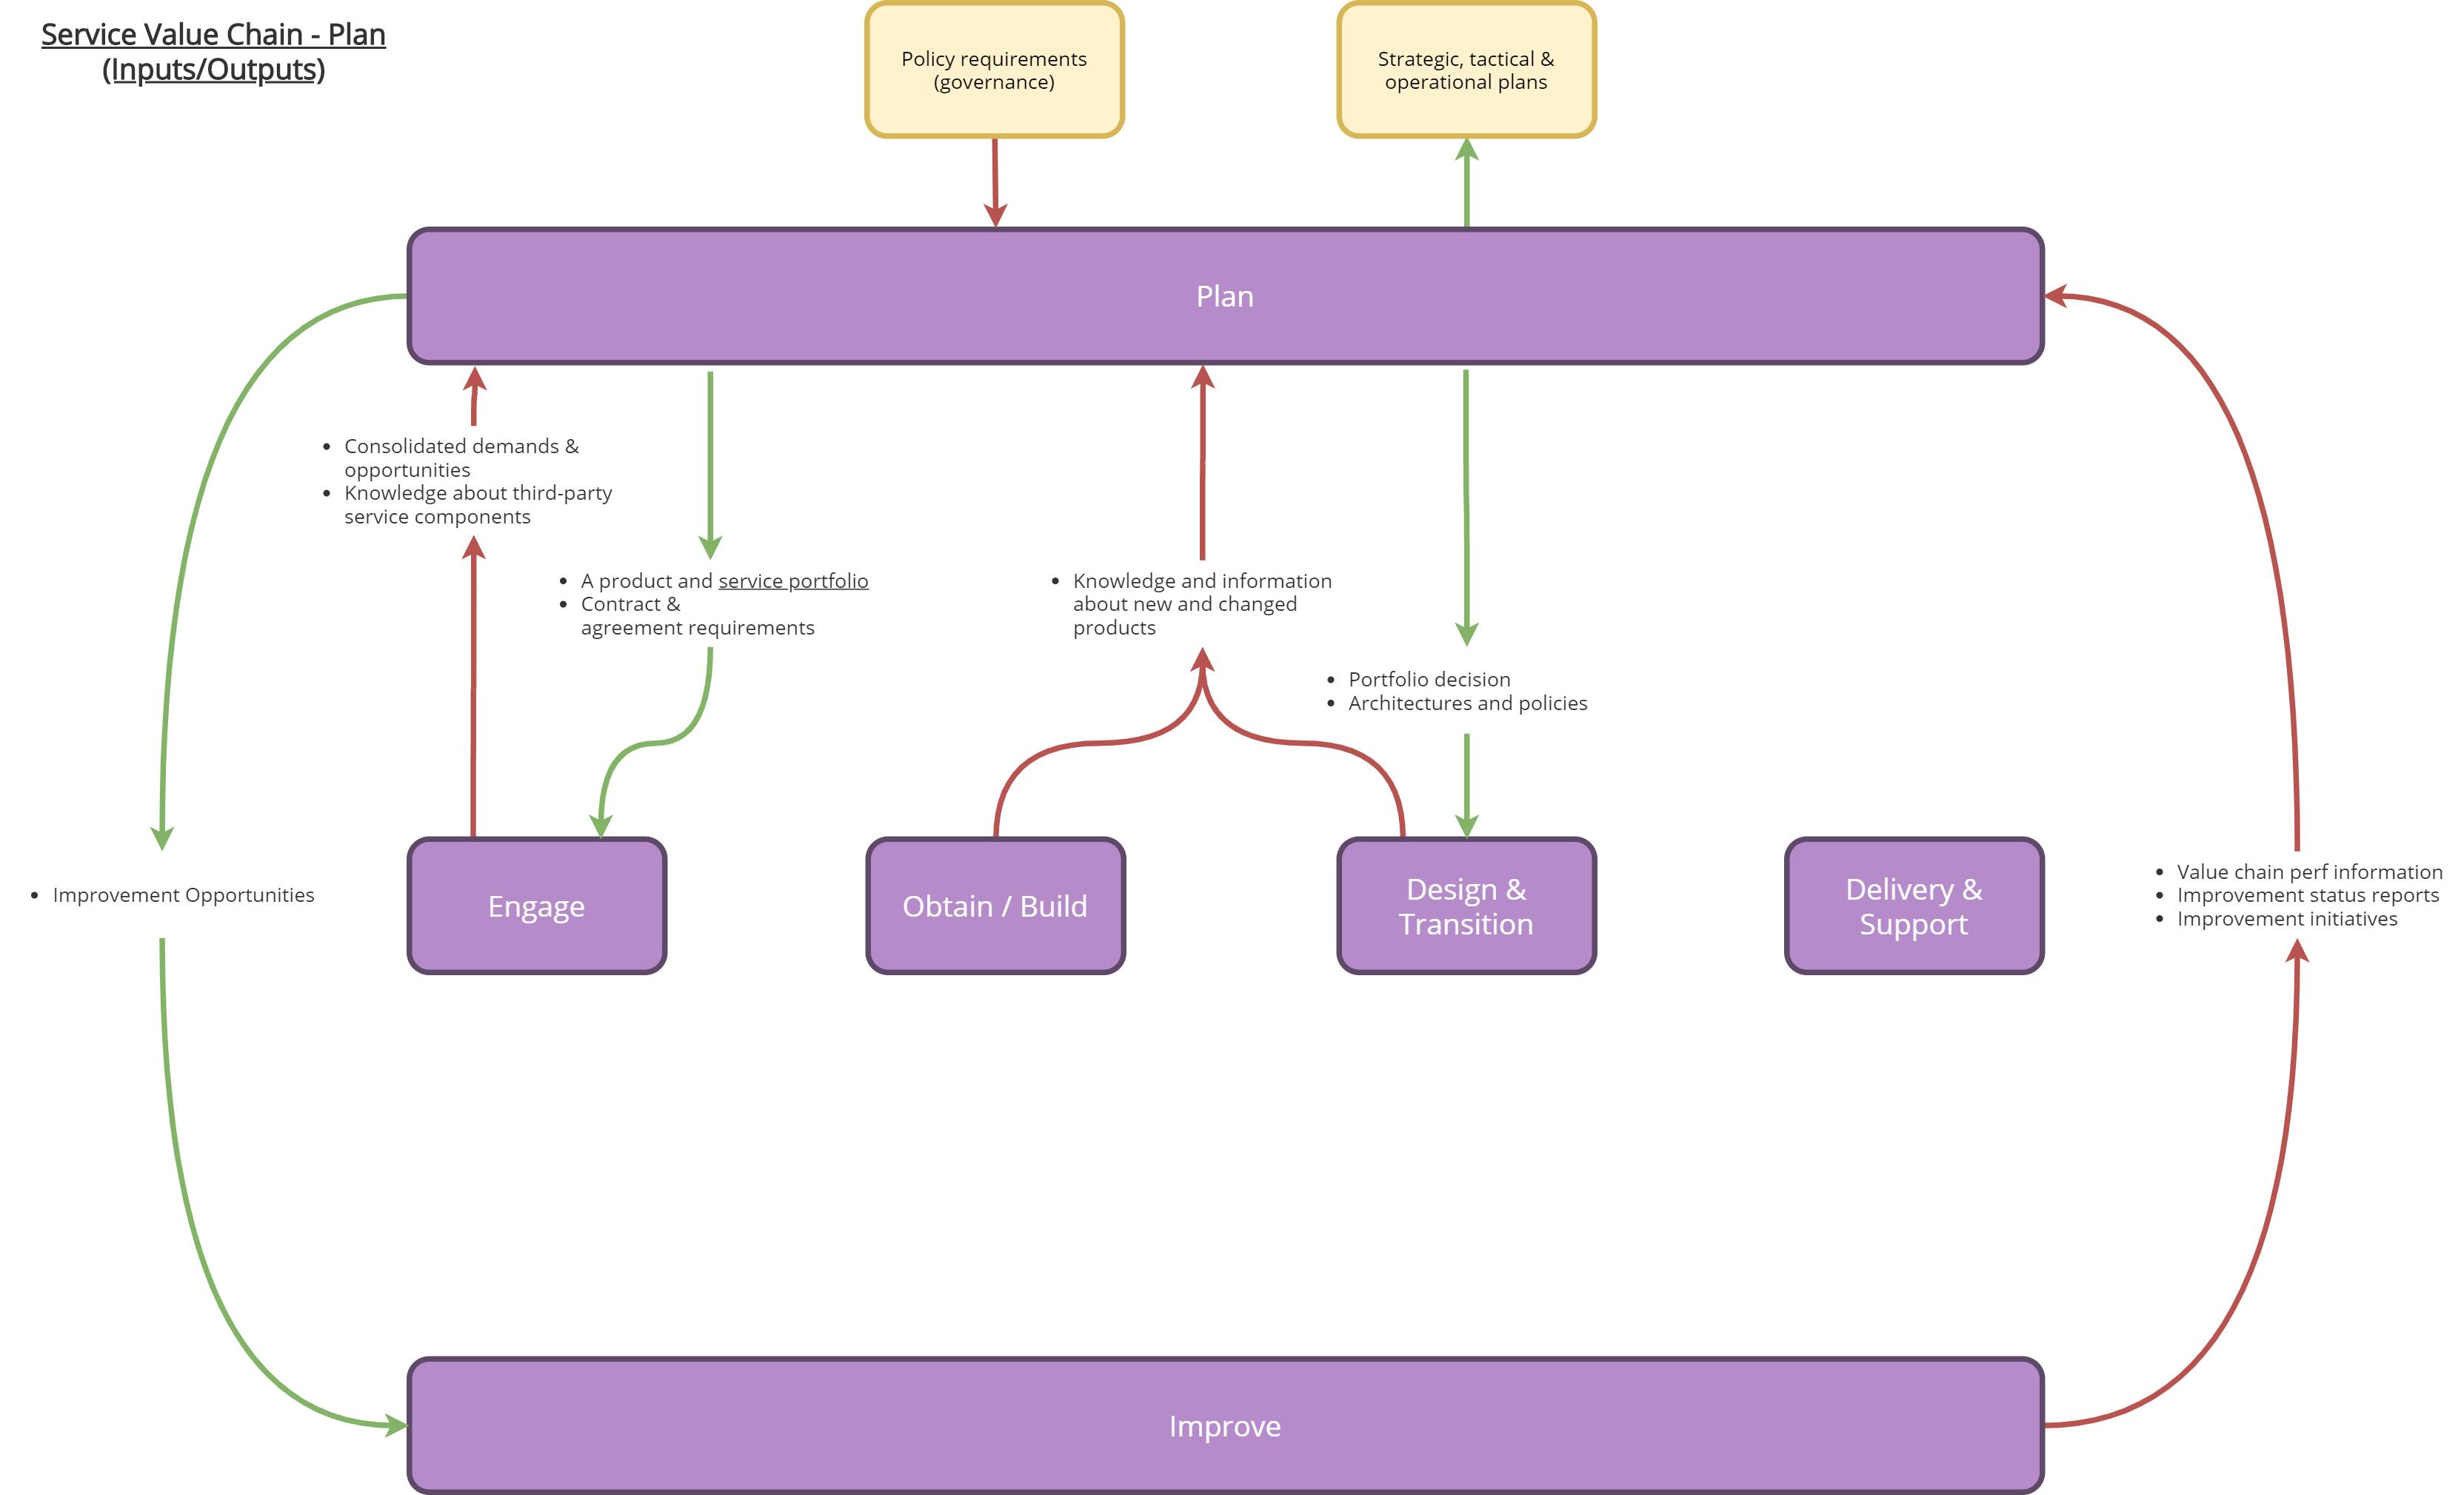 ServiceValueChainPlan – ITILv4